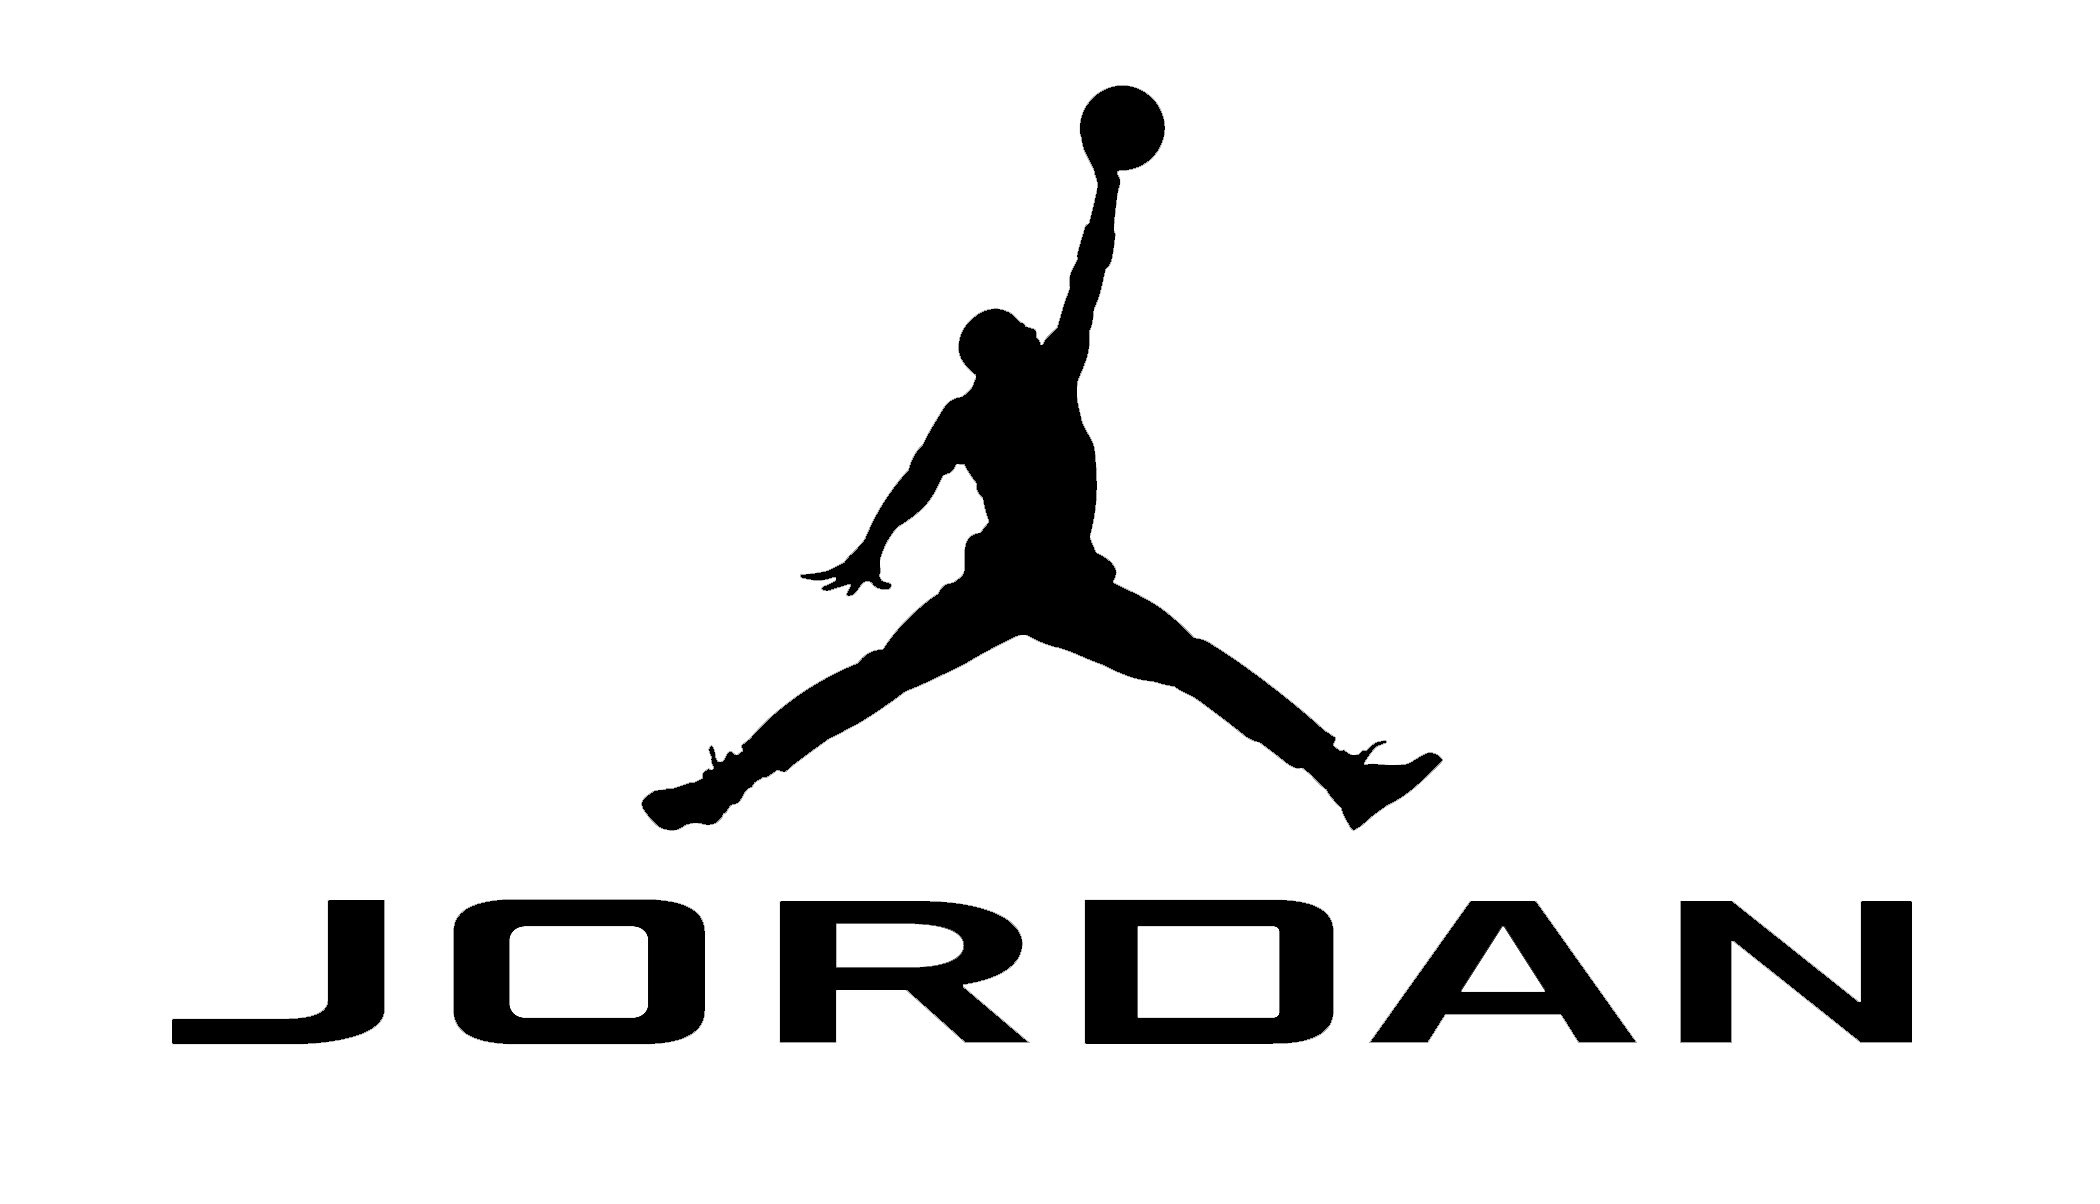 Jordan Logo Clipart #1-Jordan Logo Clipart #1-8